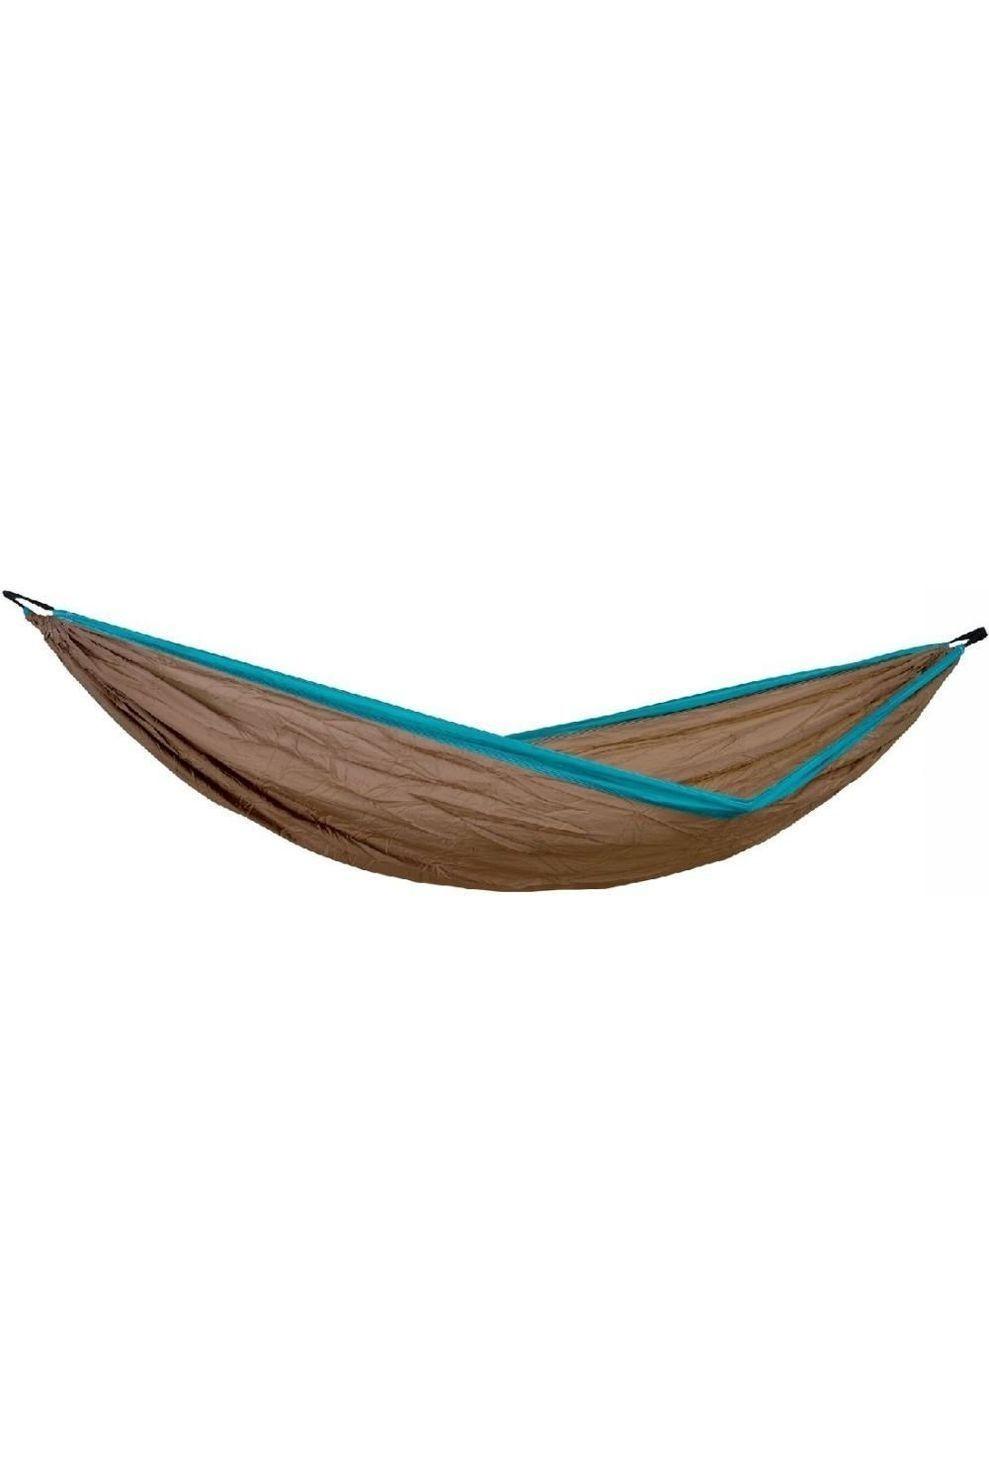 Amazonas Hangmat Silk Traveller Xl - Bruin/Blauw